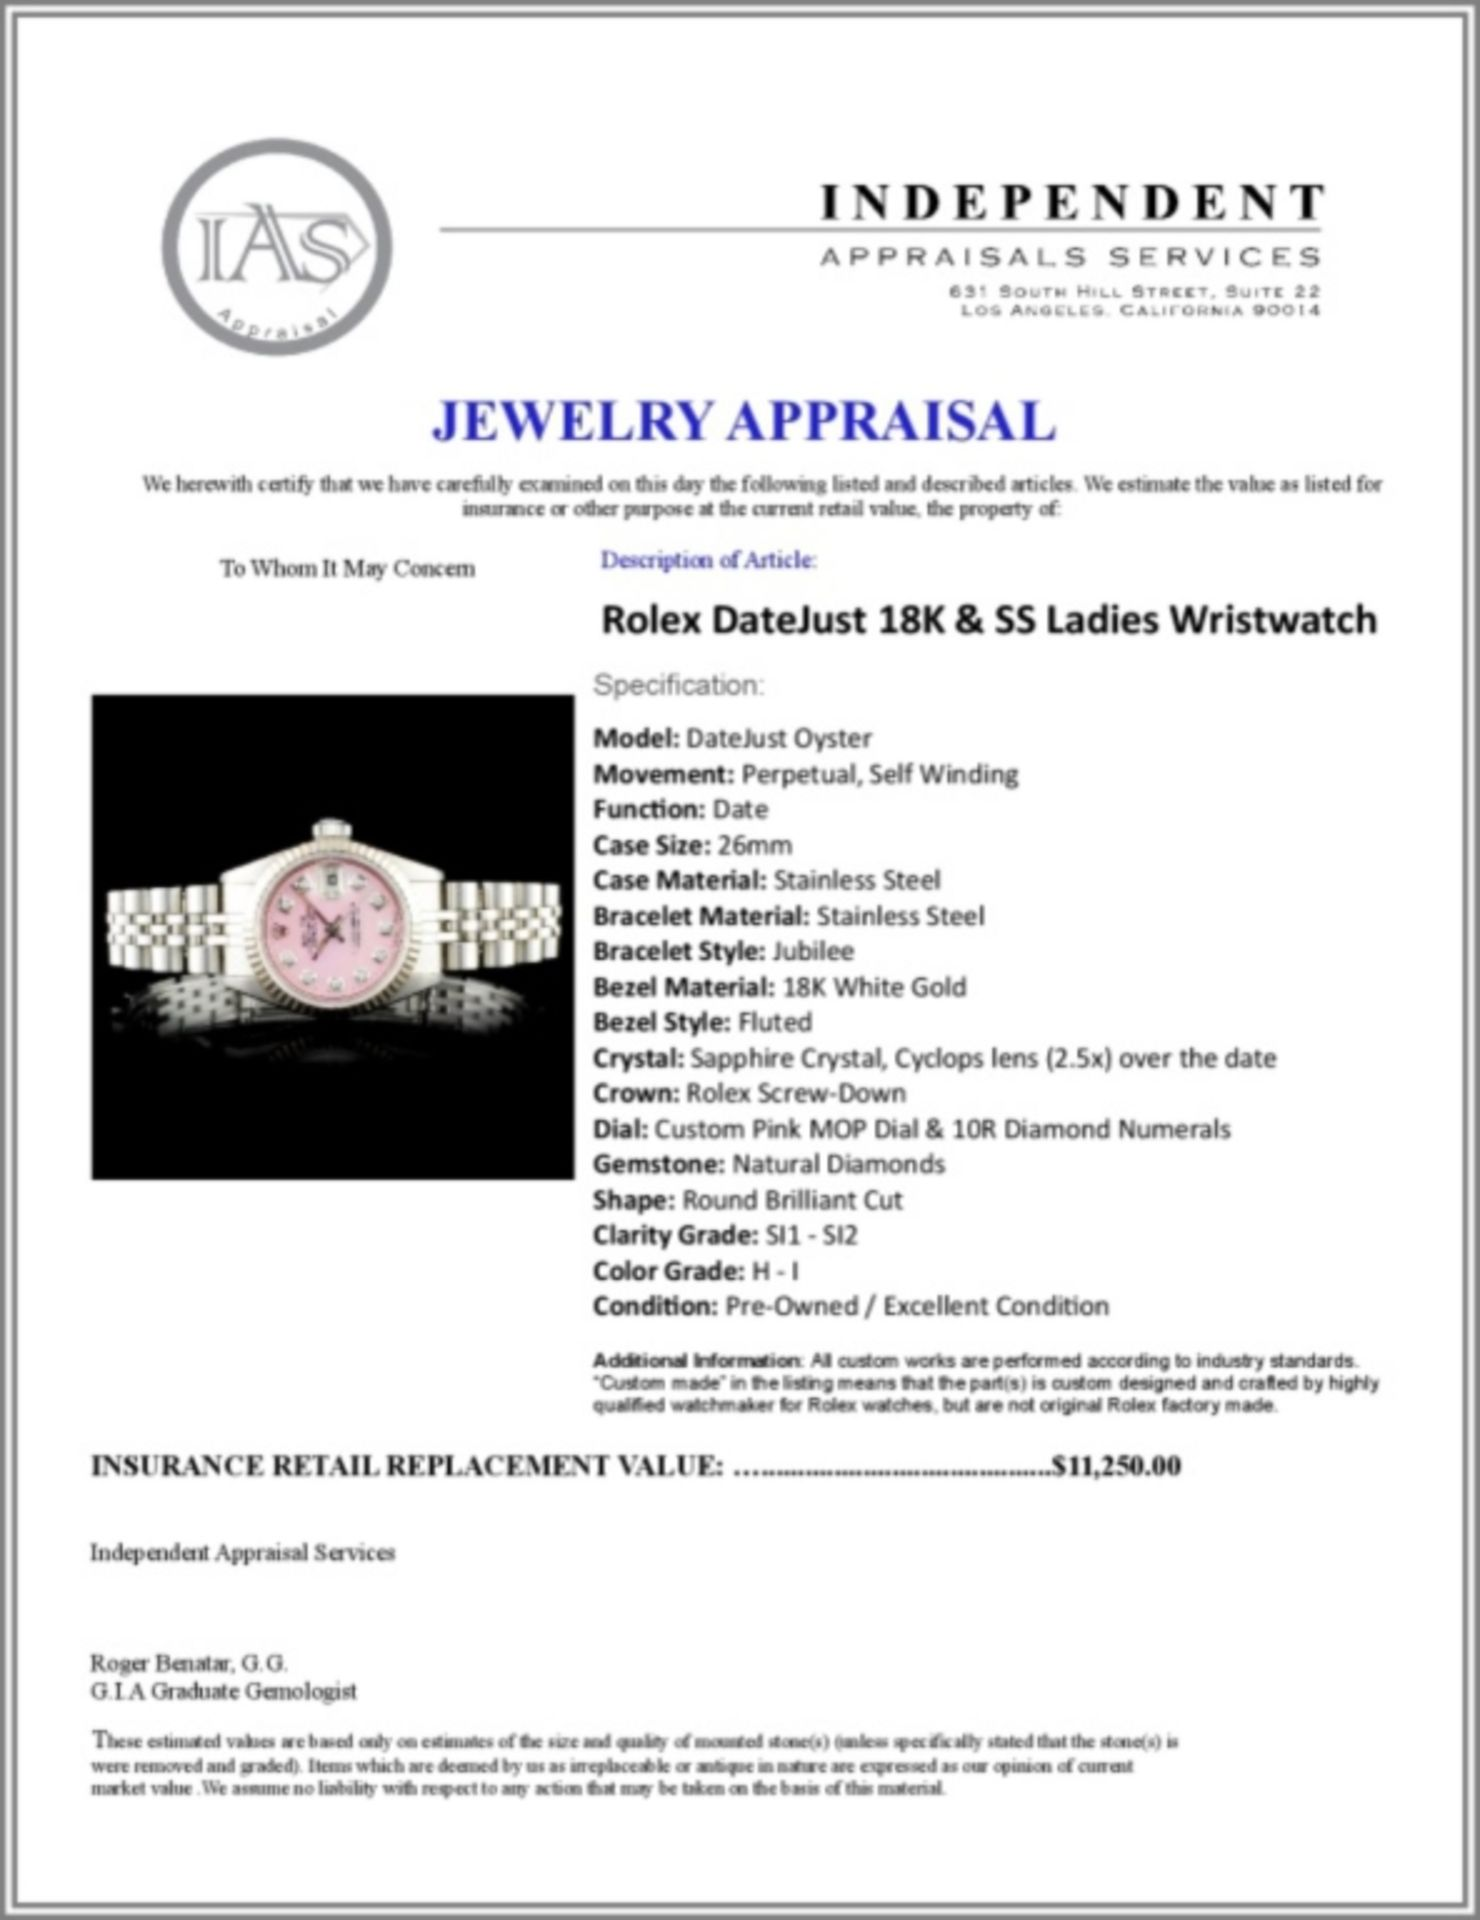 Rolex DateJust 18K & SS Ladies Wristwatch - Image 6 of 6